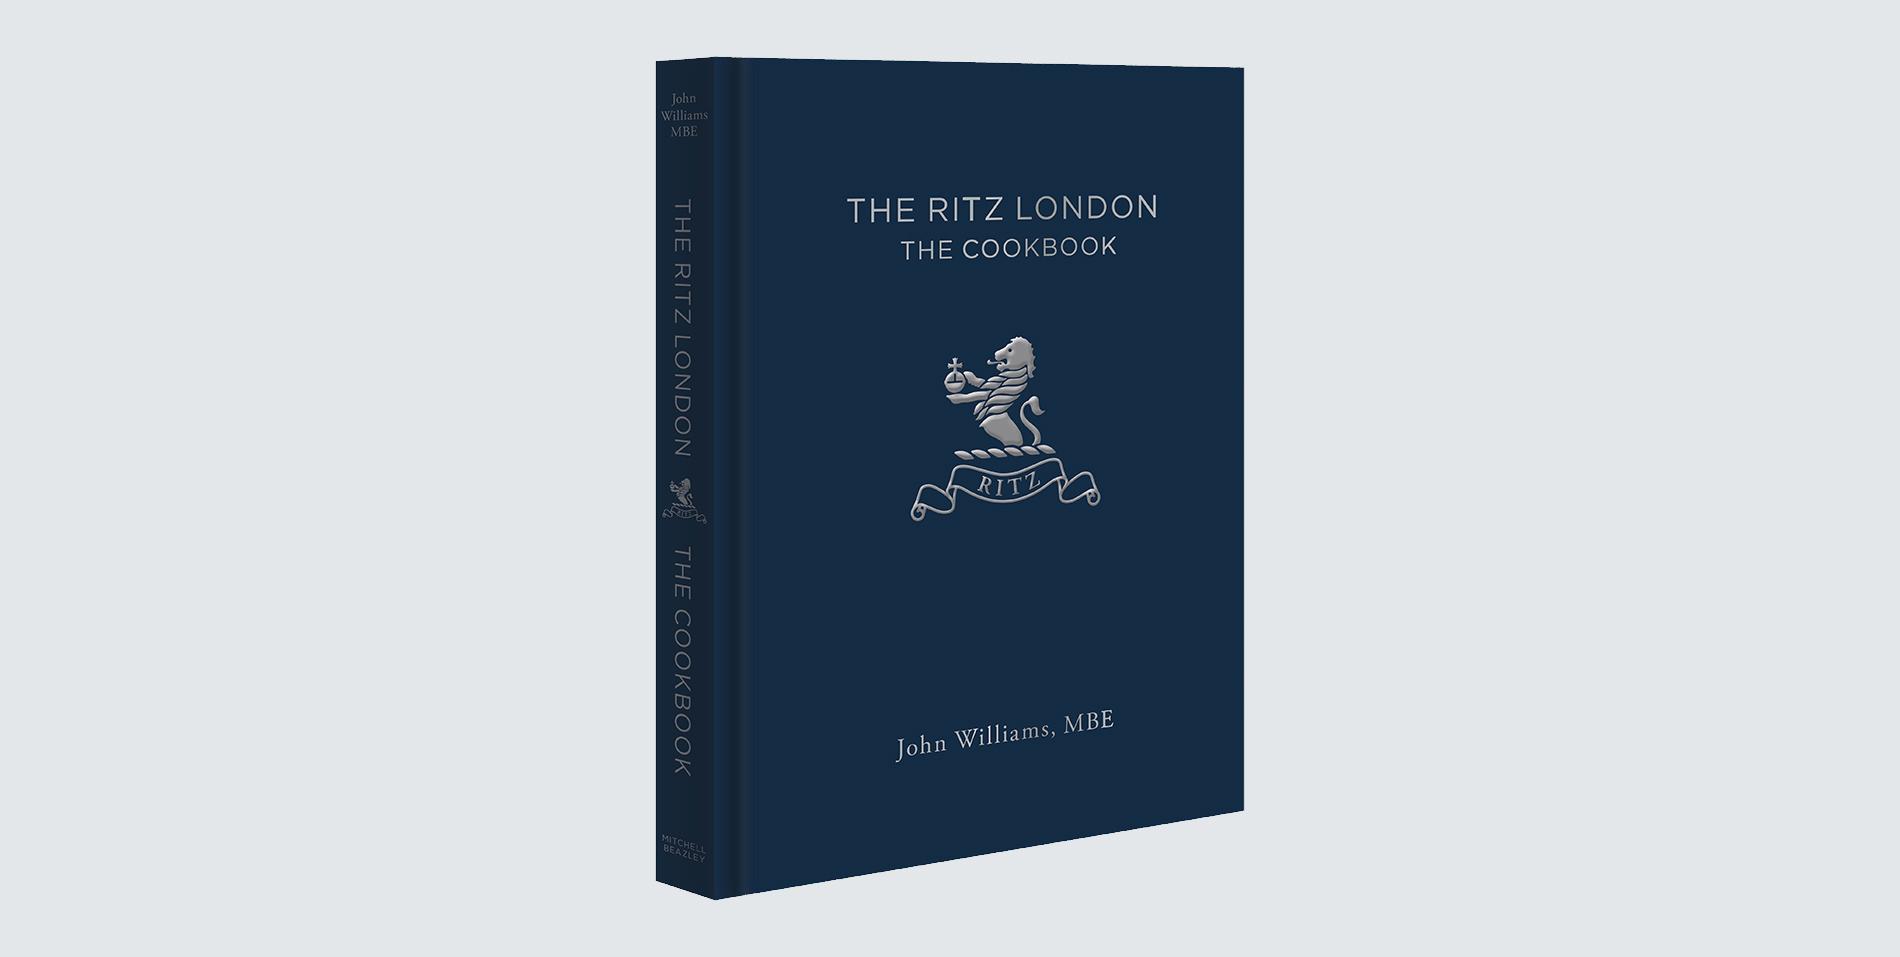 The Ritz London Cookbook